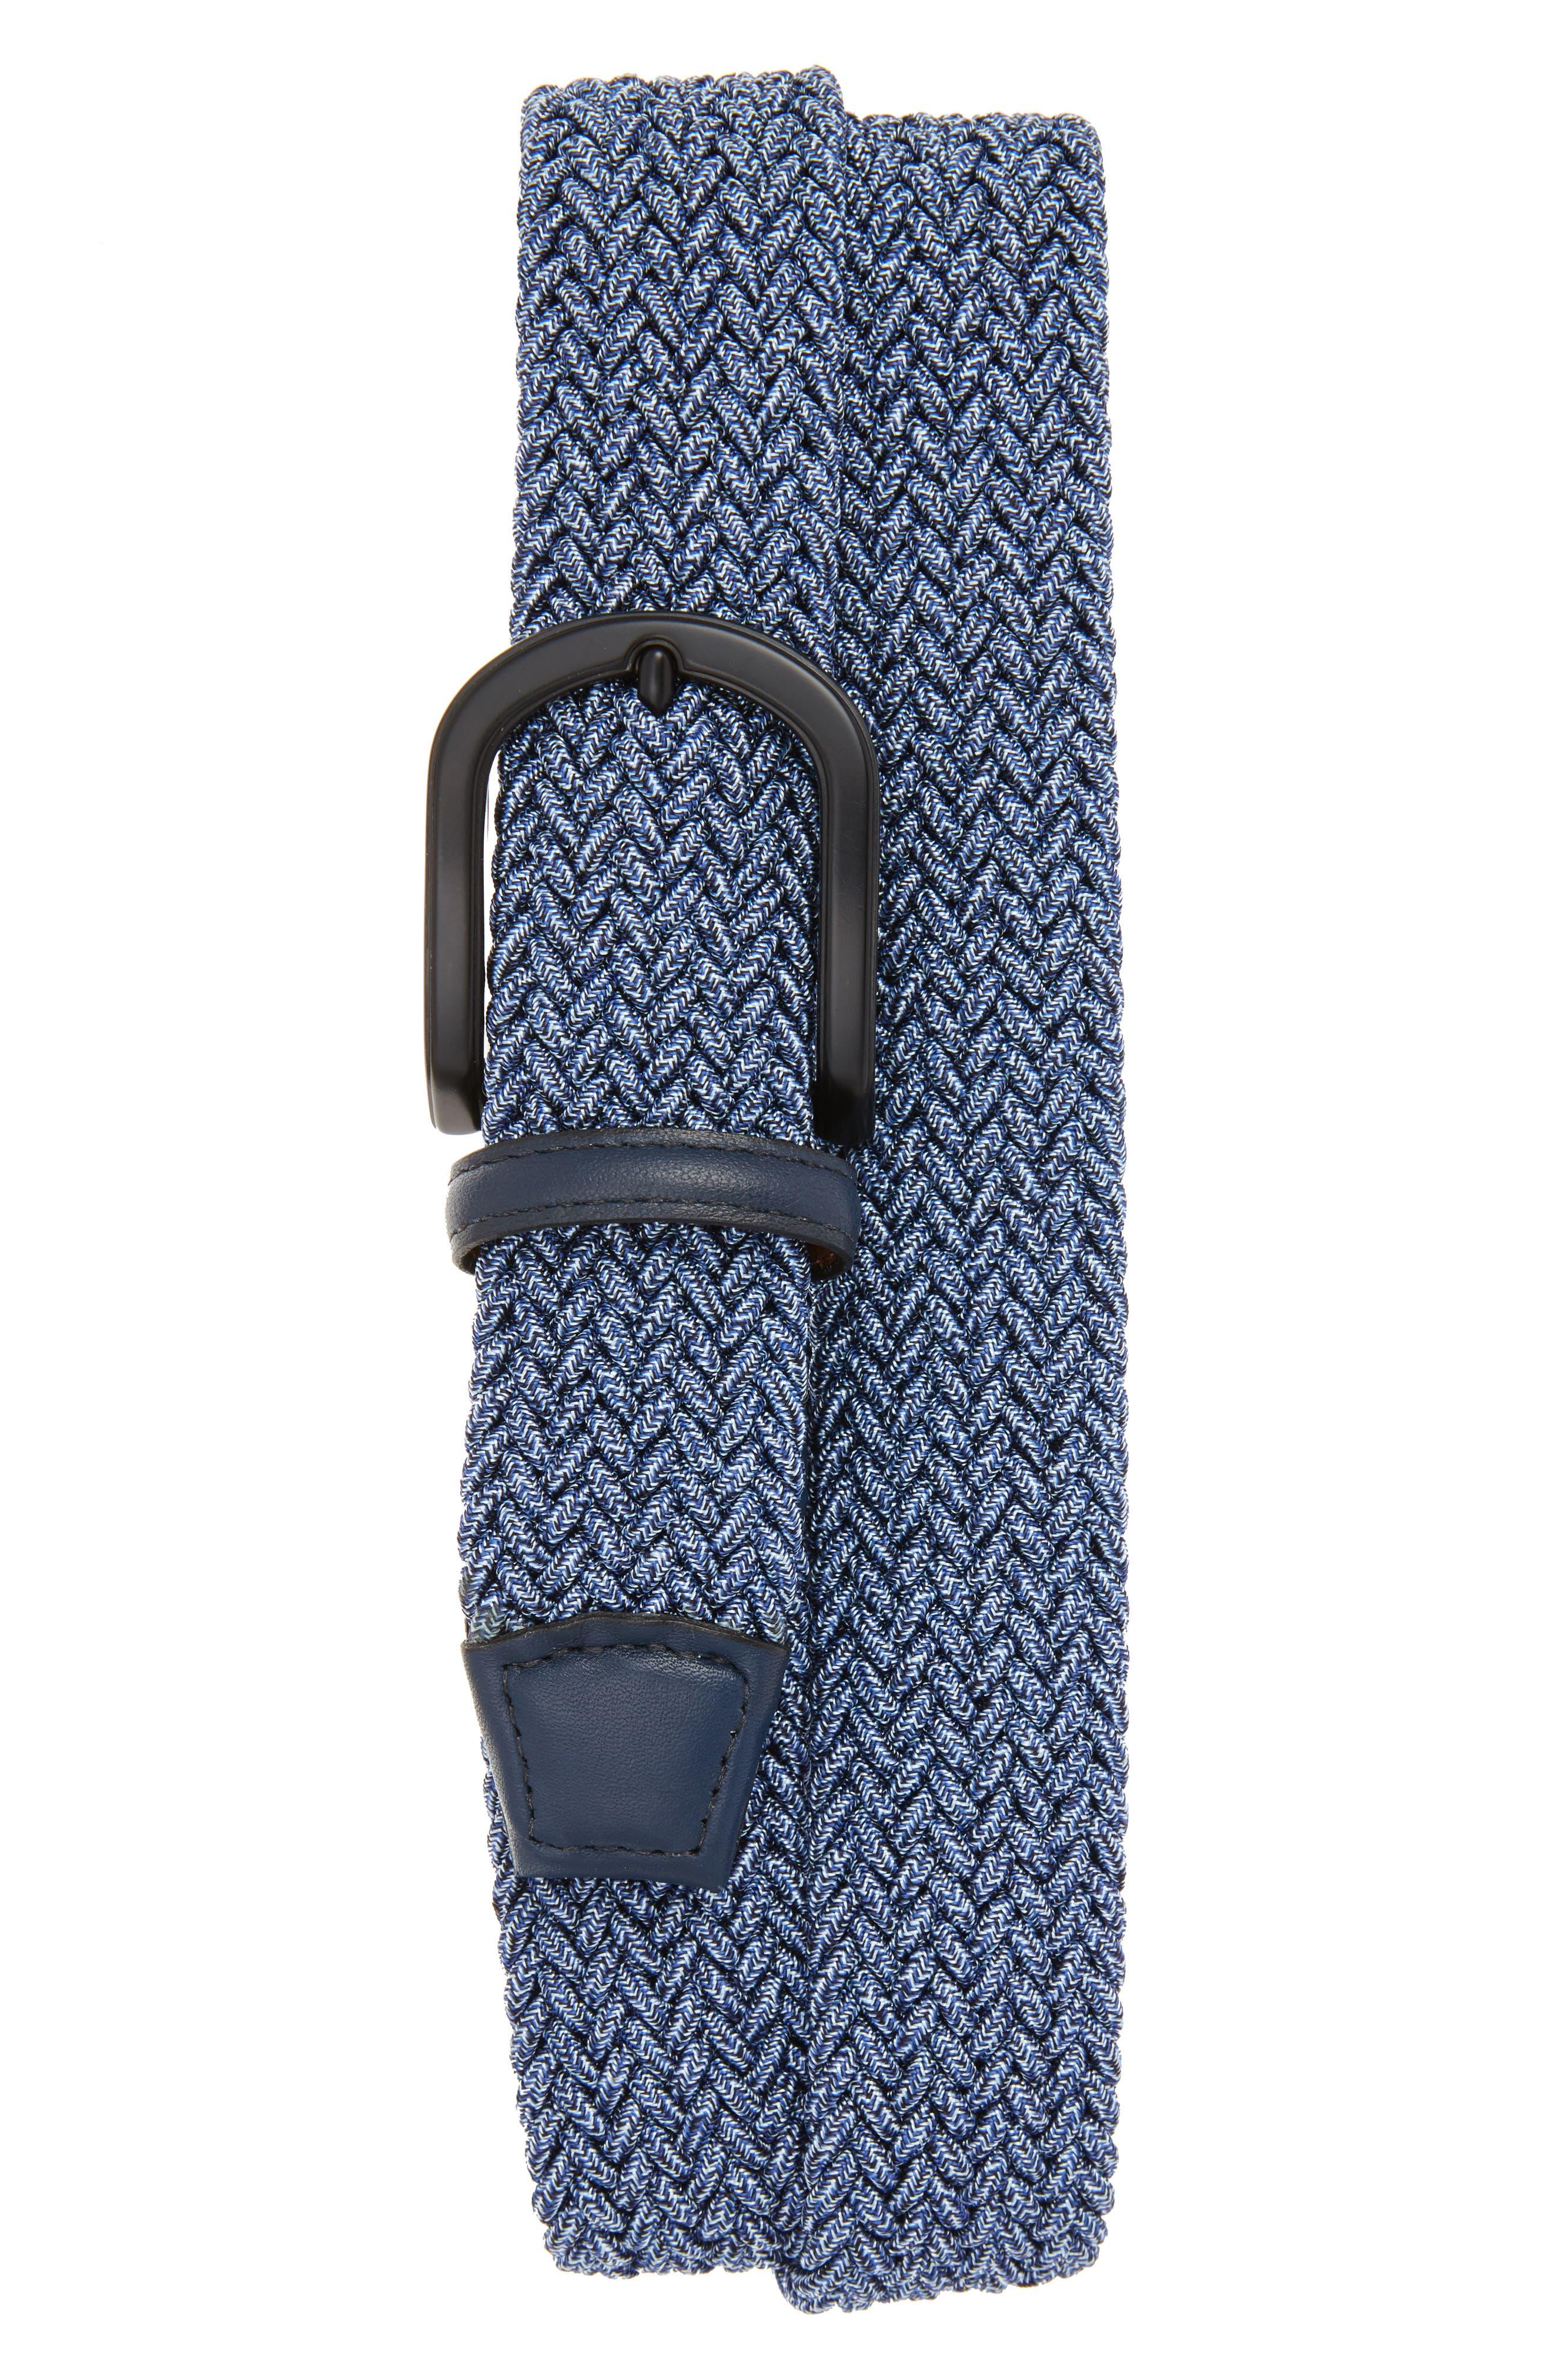 Main Image - Torino Belts Braided Mélange Belts